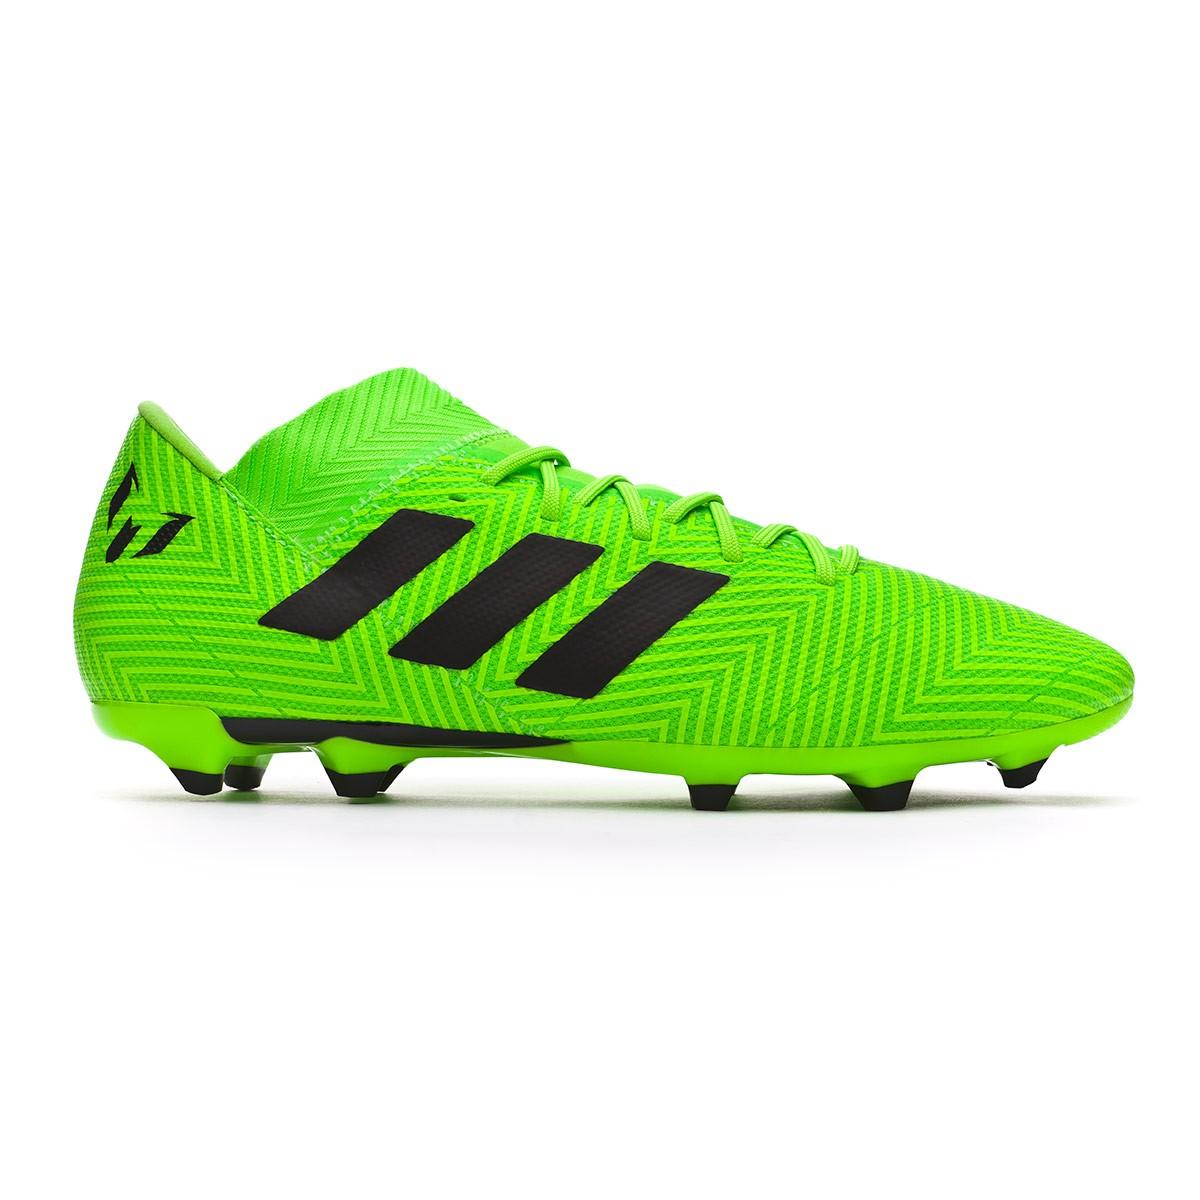 24aa74e136d7 Football Boots adidas Nemeziz Messi 18.3 FG Solar green-Black - Tienda de  fútbol Fútbol Emotion